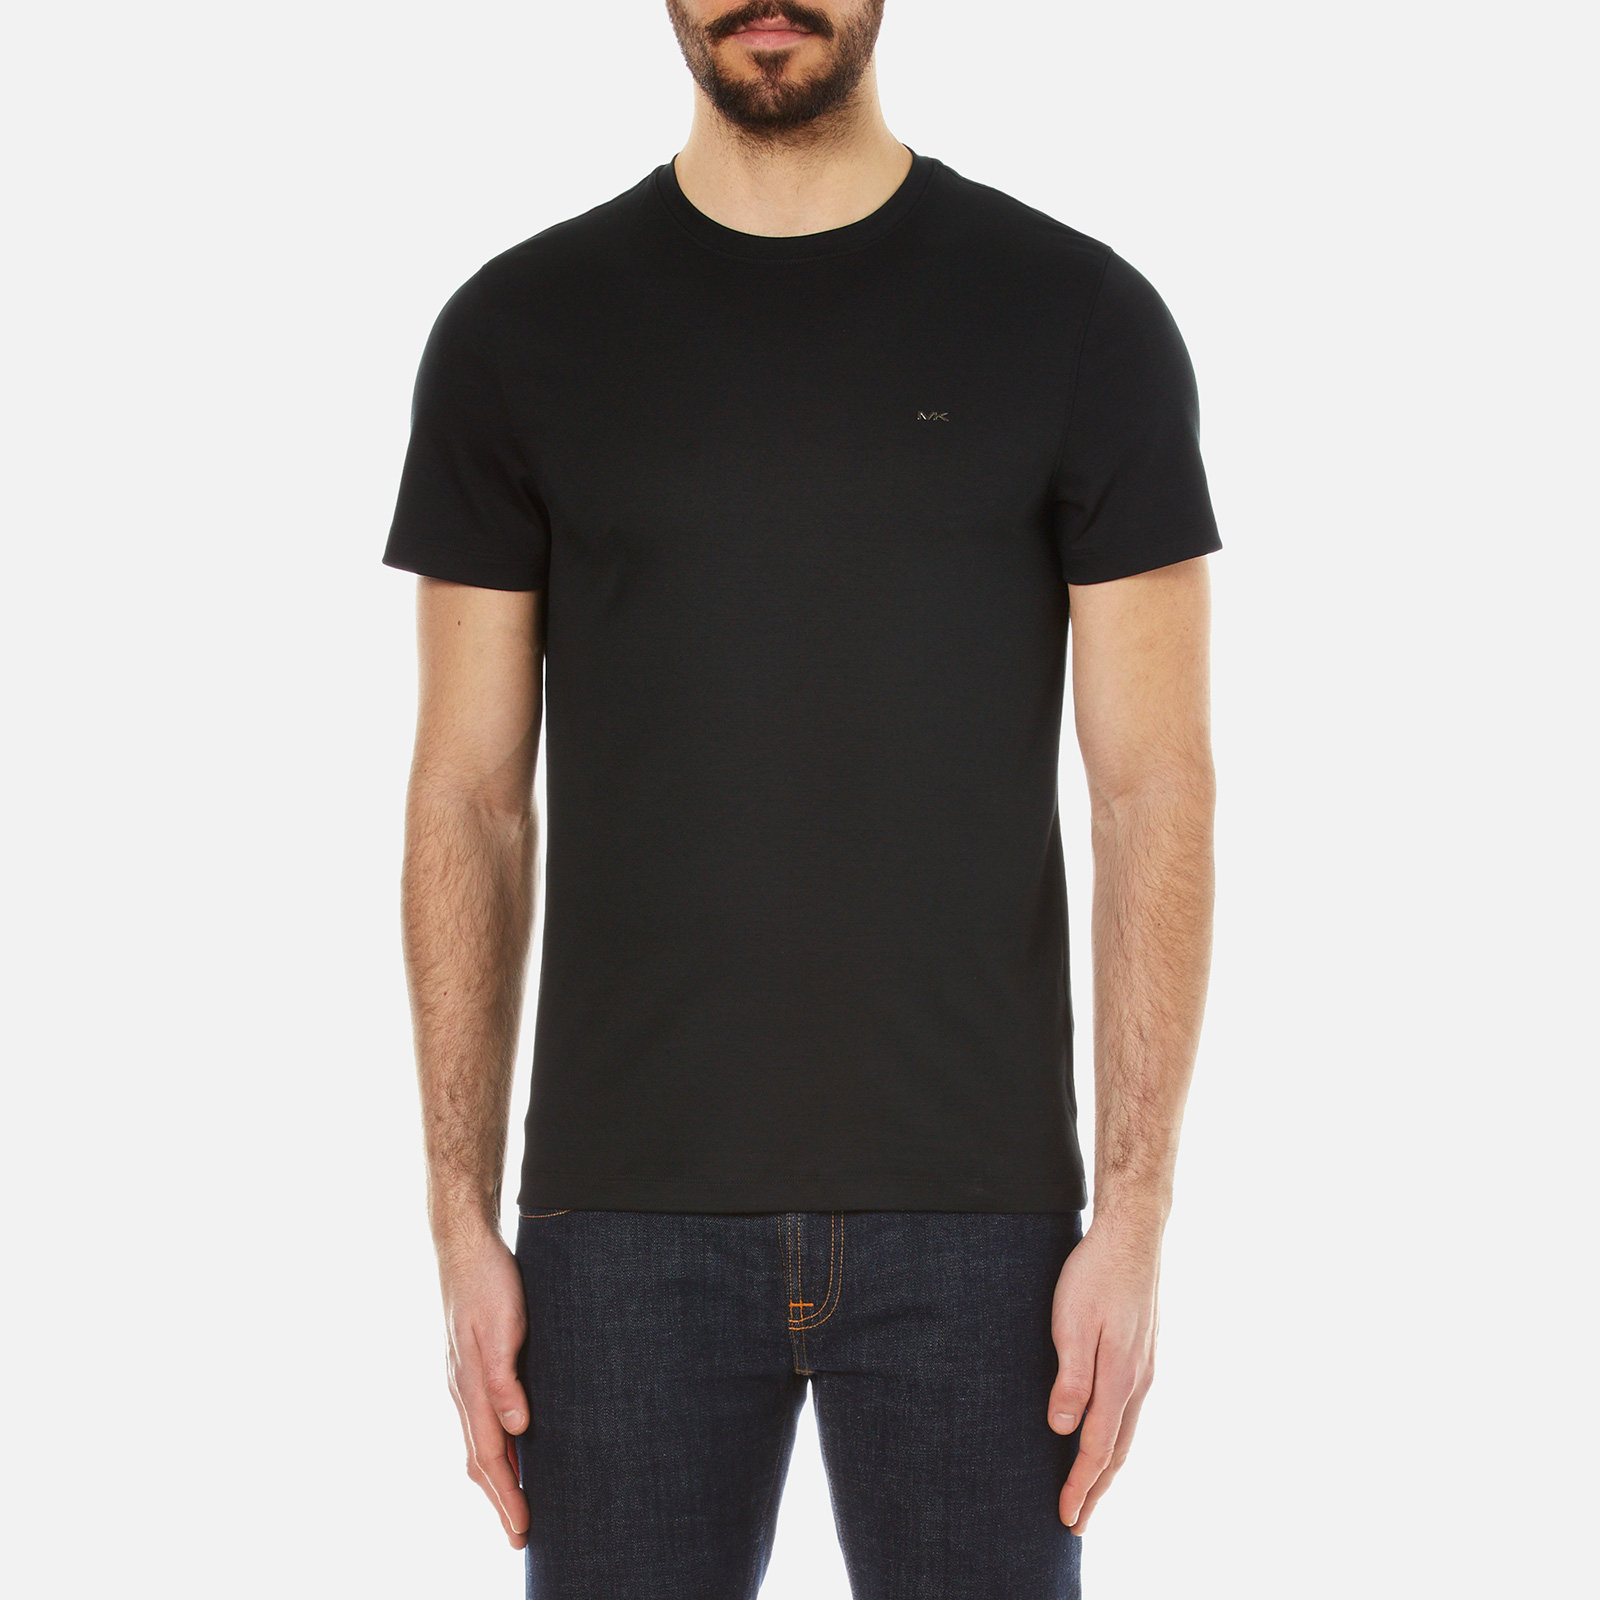 5c284dd9 Michael Kors Men's Sleek MK Crew T-Shirt - Black - Free UK Delivery over £50